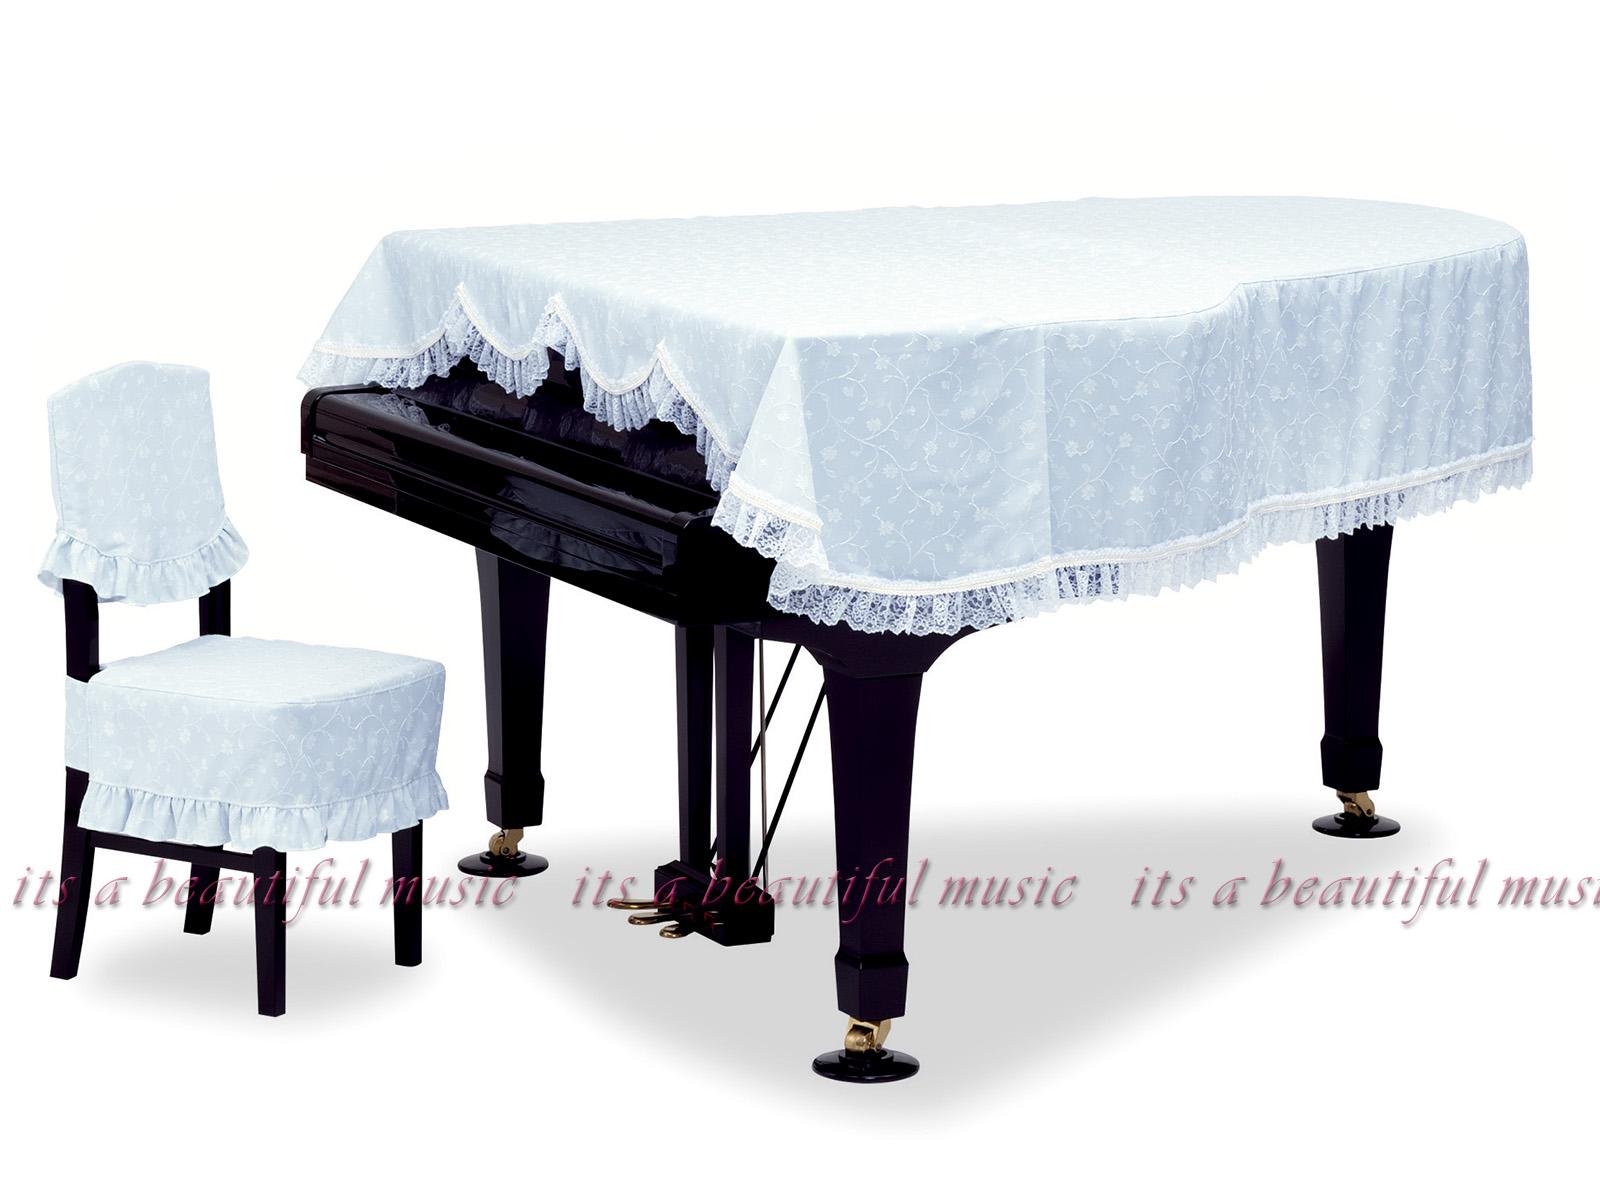 【its】レビューでもれなく高級クロス同梱!グランドピアノカバー 吉澤GP-572FB「爽やかな空色に小花と音符柄」【奥行150~160cm未満/A1/GB1K/GM12/G-156等】(ヨシザワ572FBシリーズ)